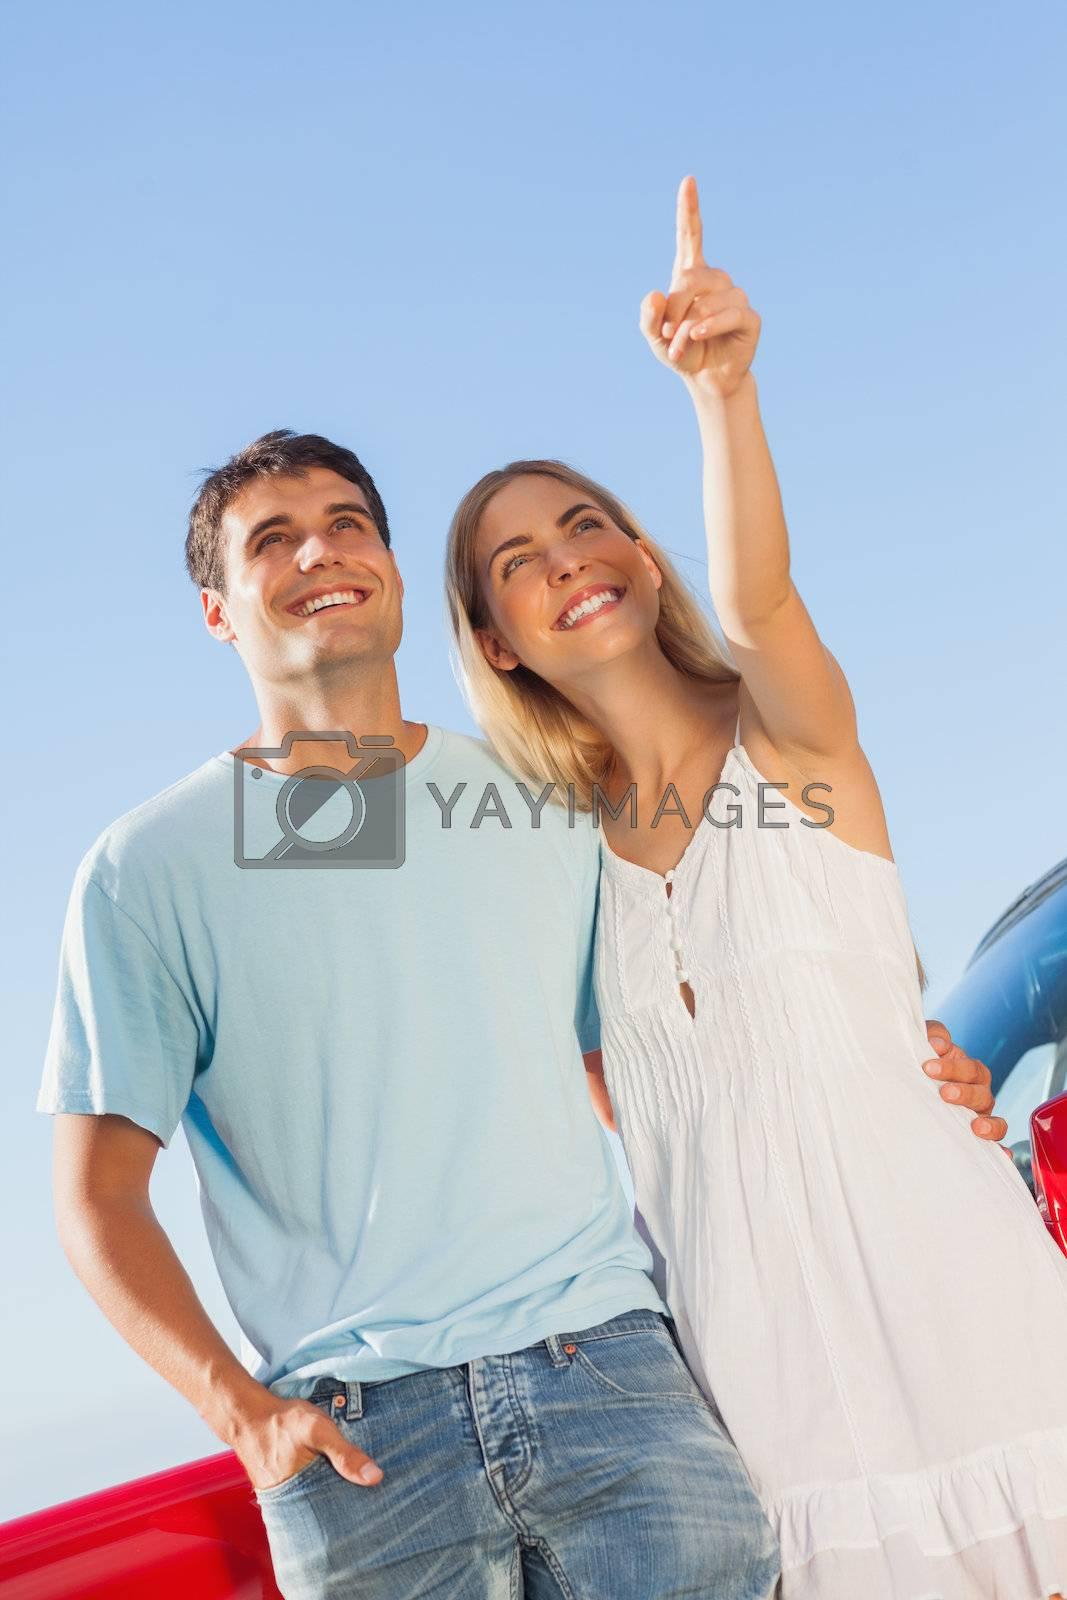 Happy woman showing something to her handsome boyfriend by Wavebreakmedia